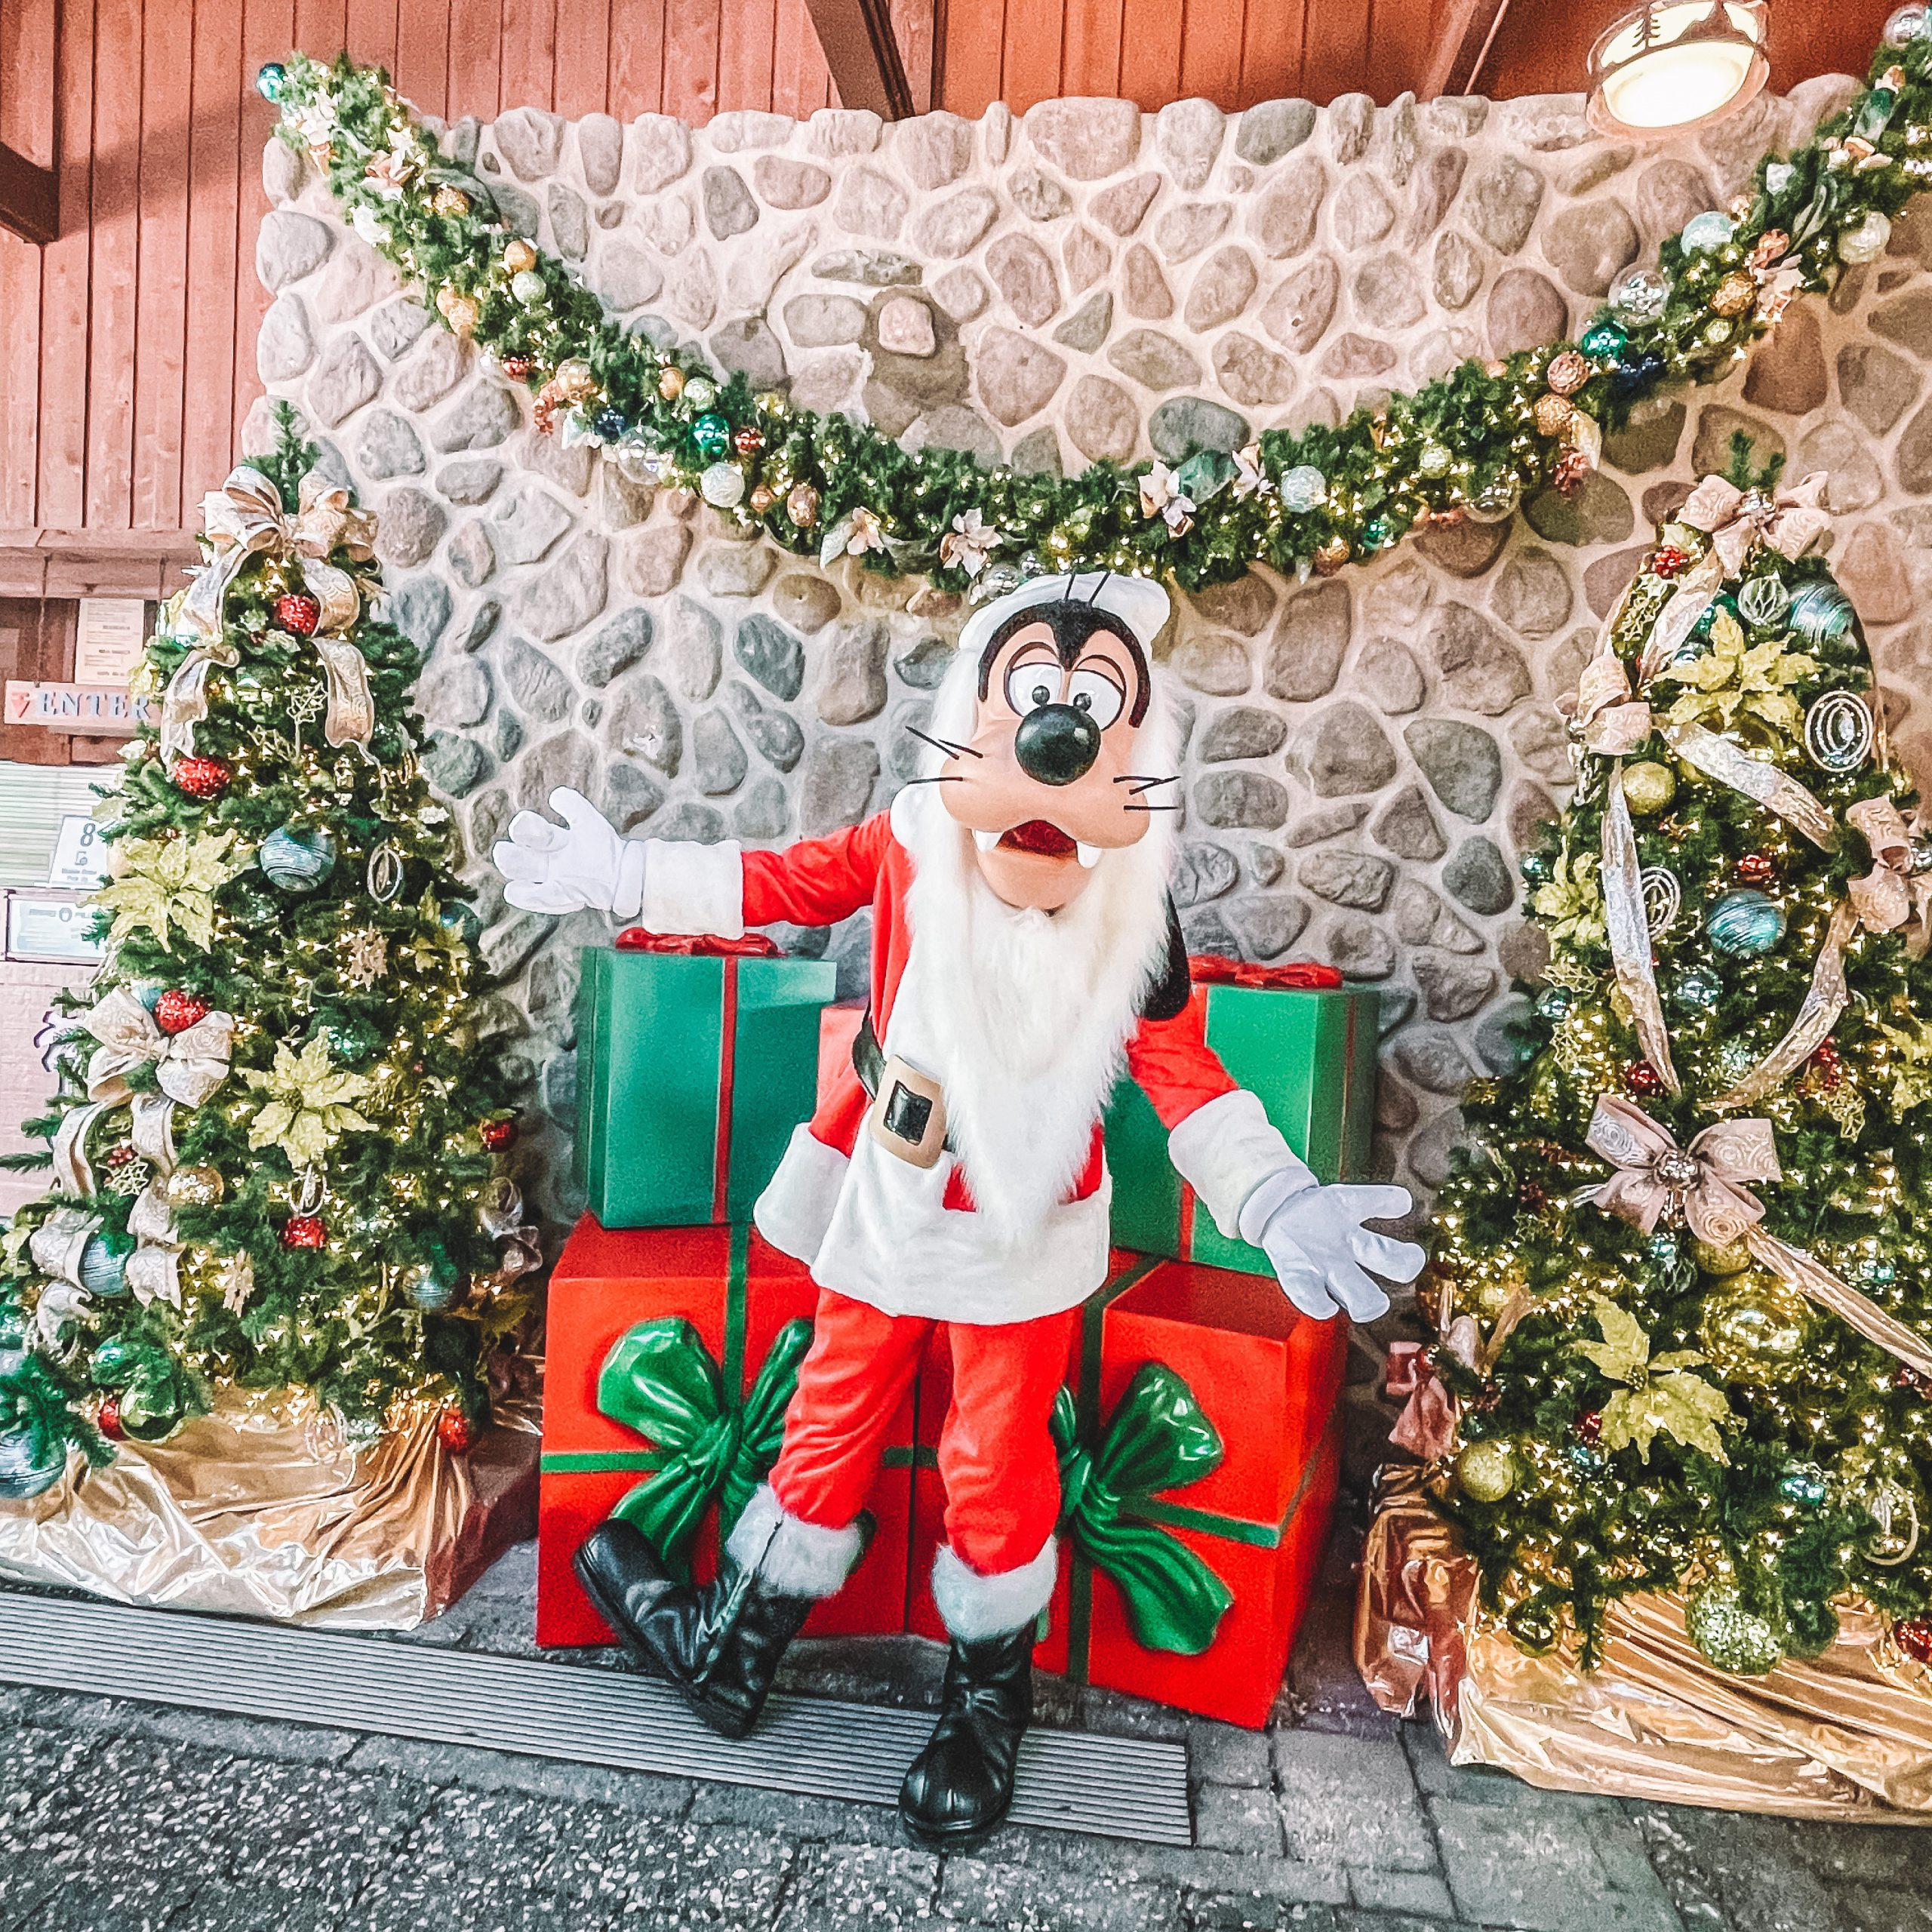 Celebrating The Holiday Season At Walt Disney World